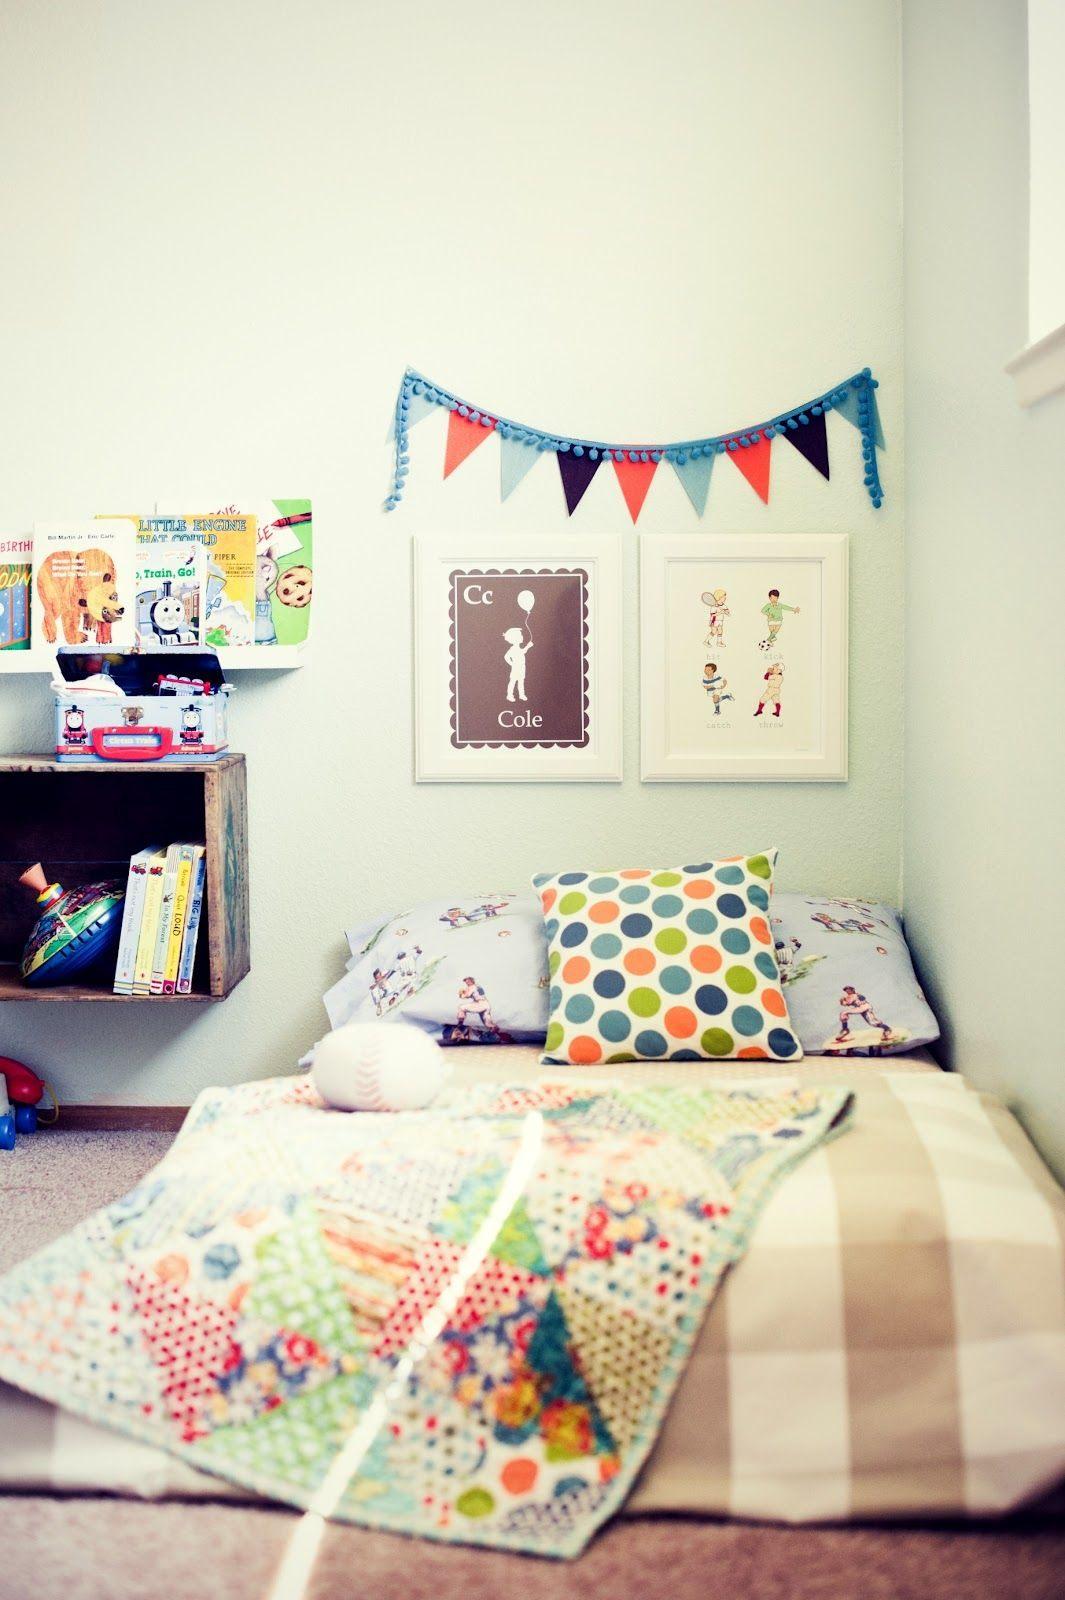 Lit Bebe Barreau Unique Mattress On the Floor = toddler Bed Montessori Nursery